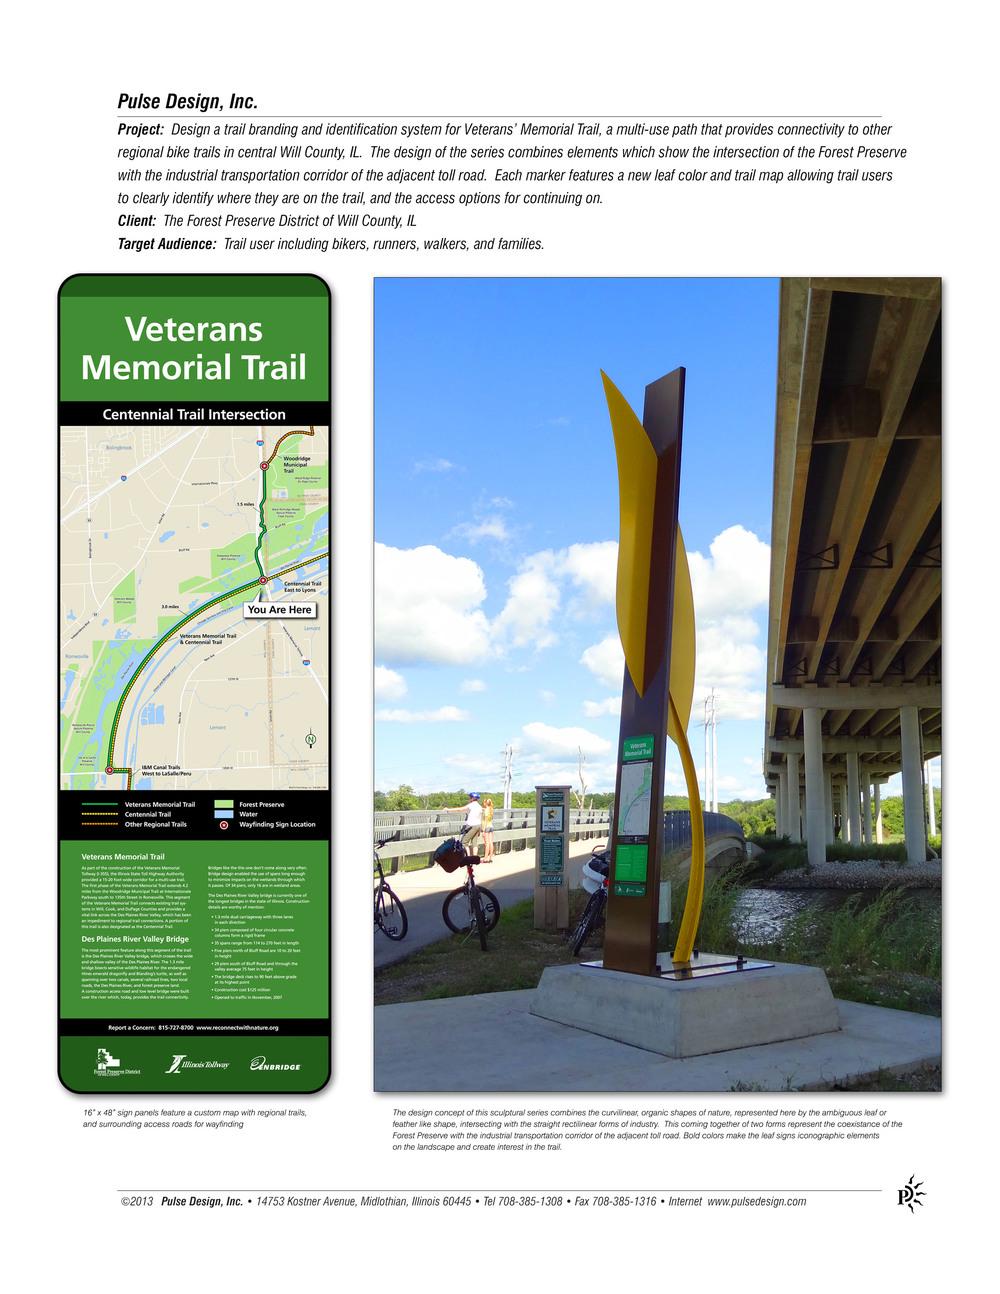 Veterans-Memorial-Trail-Sign-Photo-Yellow-Pulse-Design-Inc.jpg